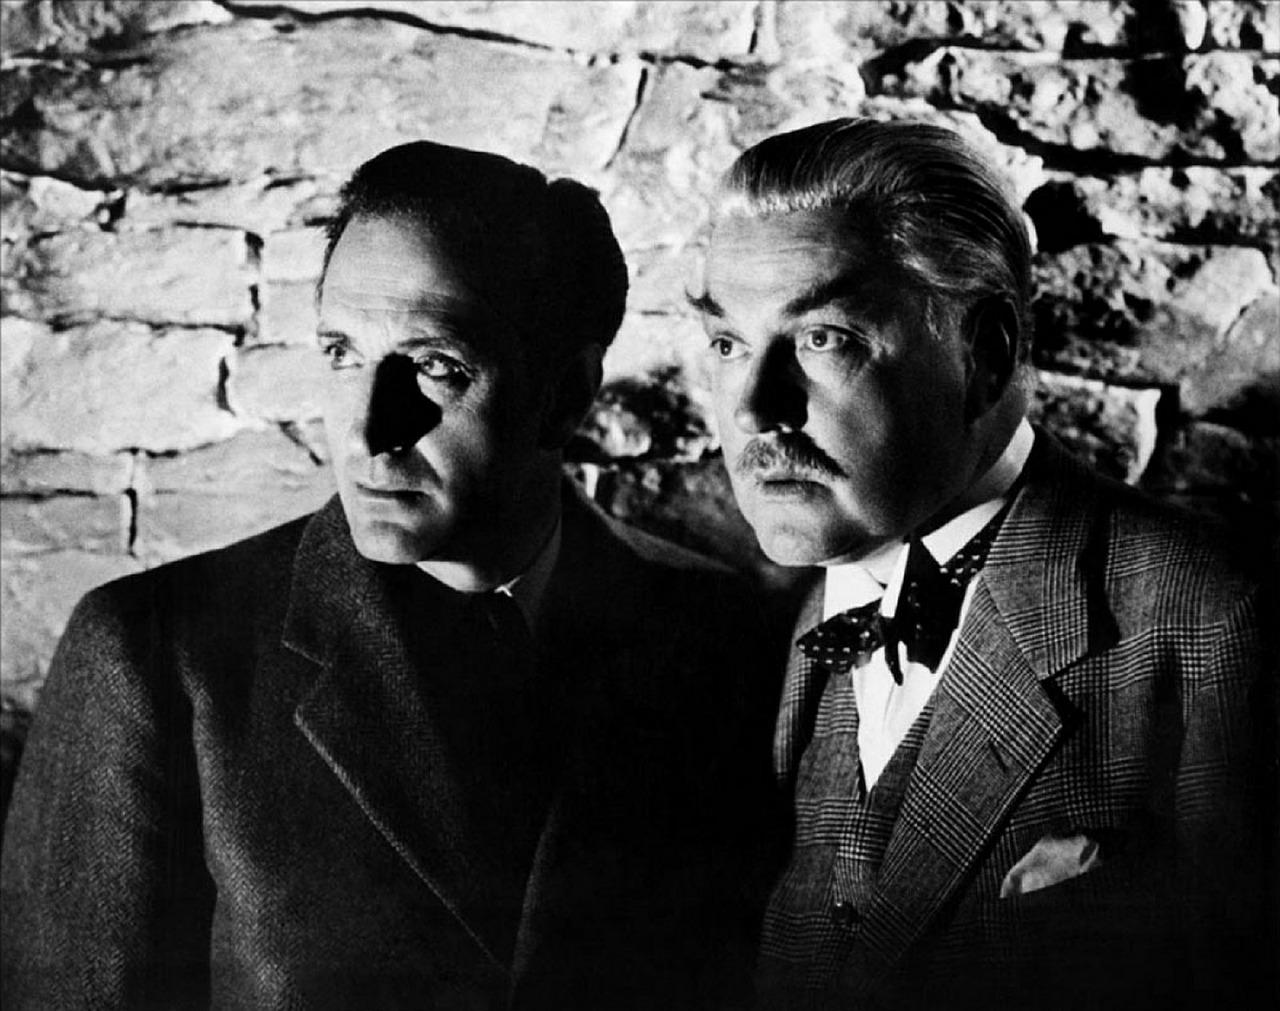 Basil Rathbone as Sherlock Holmes and Nigel Bruce as Dr. Watson